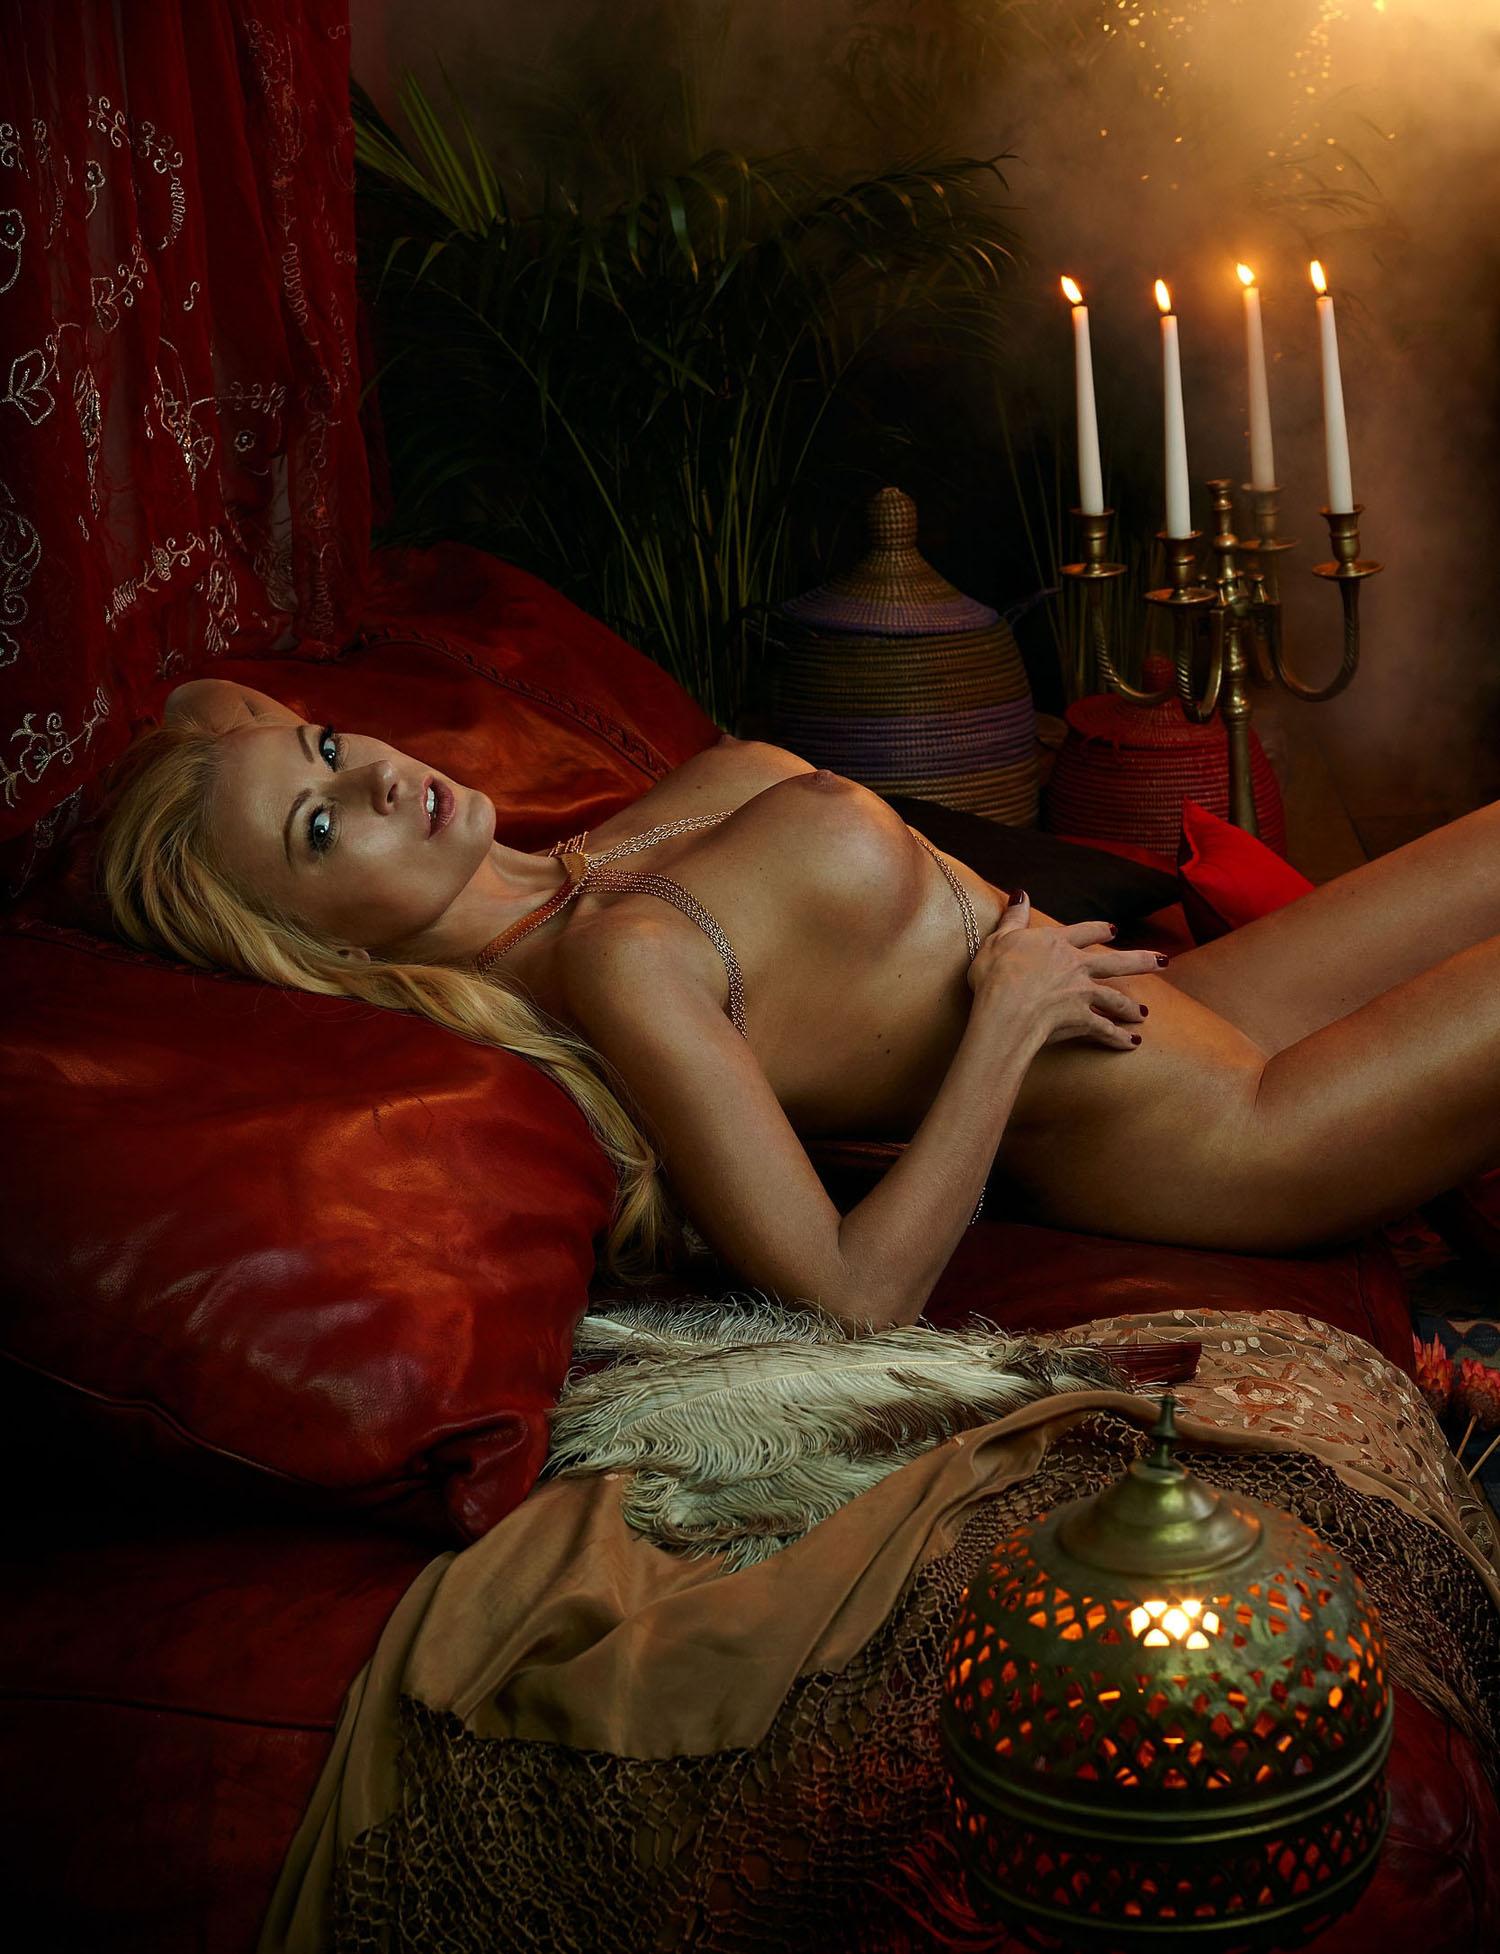 Дженни Элверс голая. Фото - 15